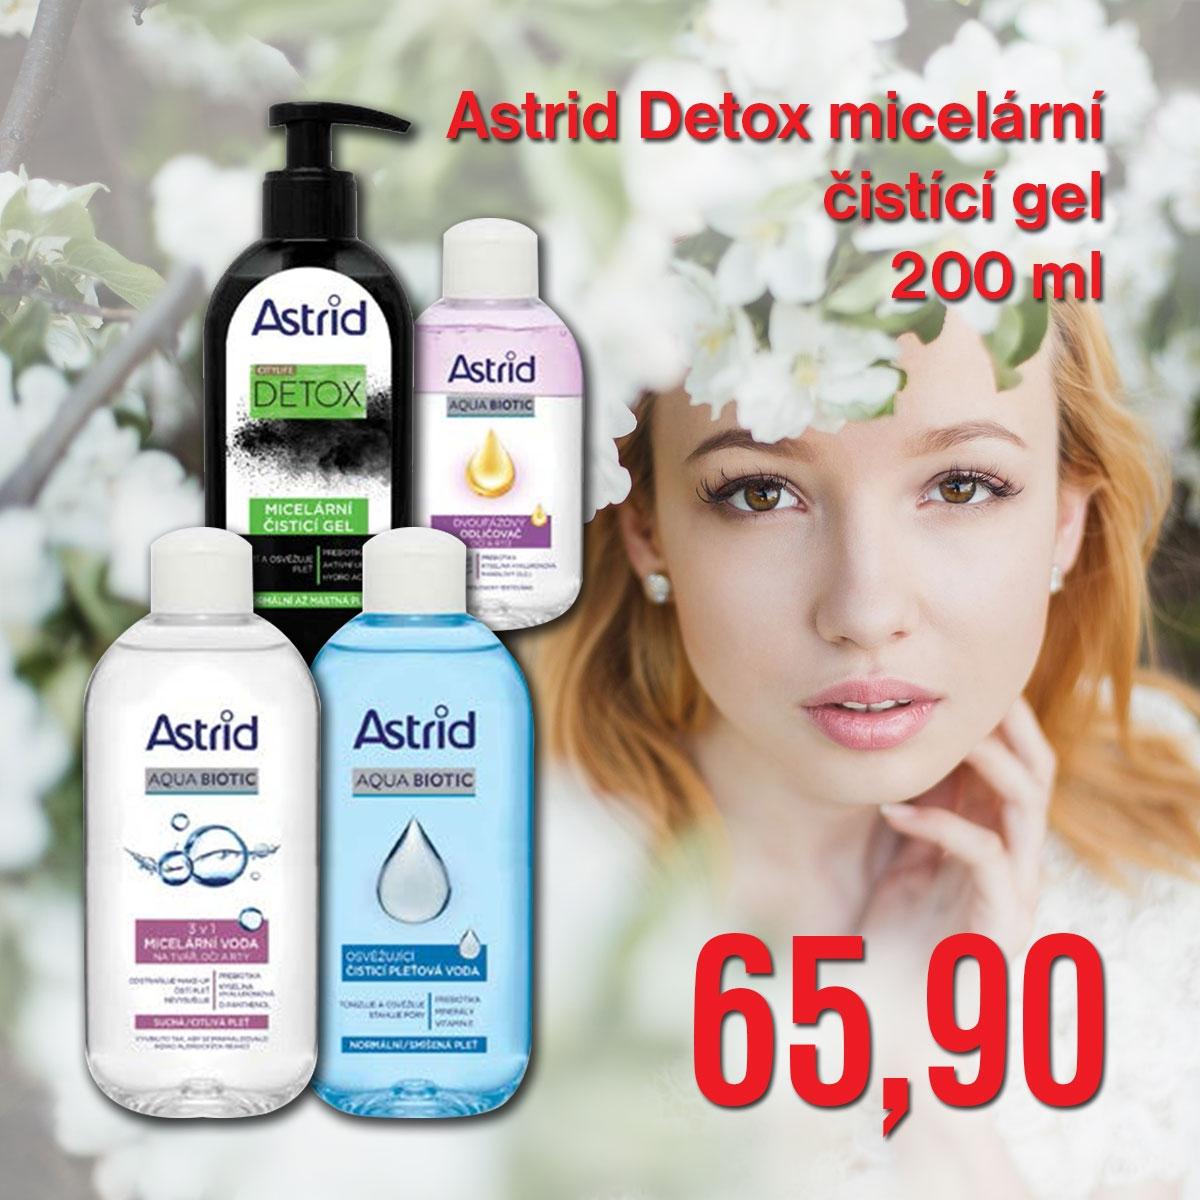 Astrid Detox micelární čistící gel 200 ml